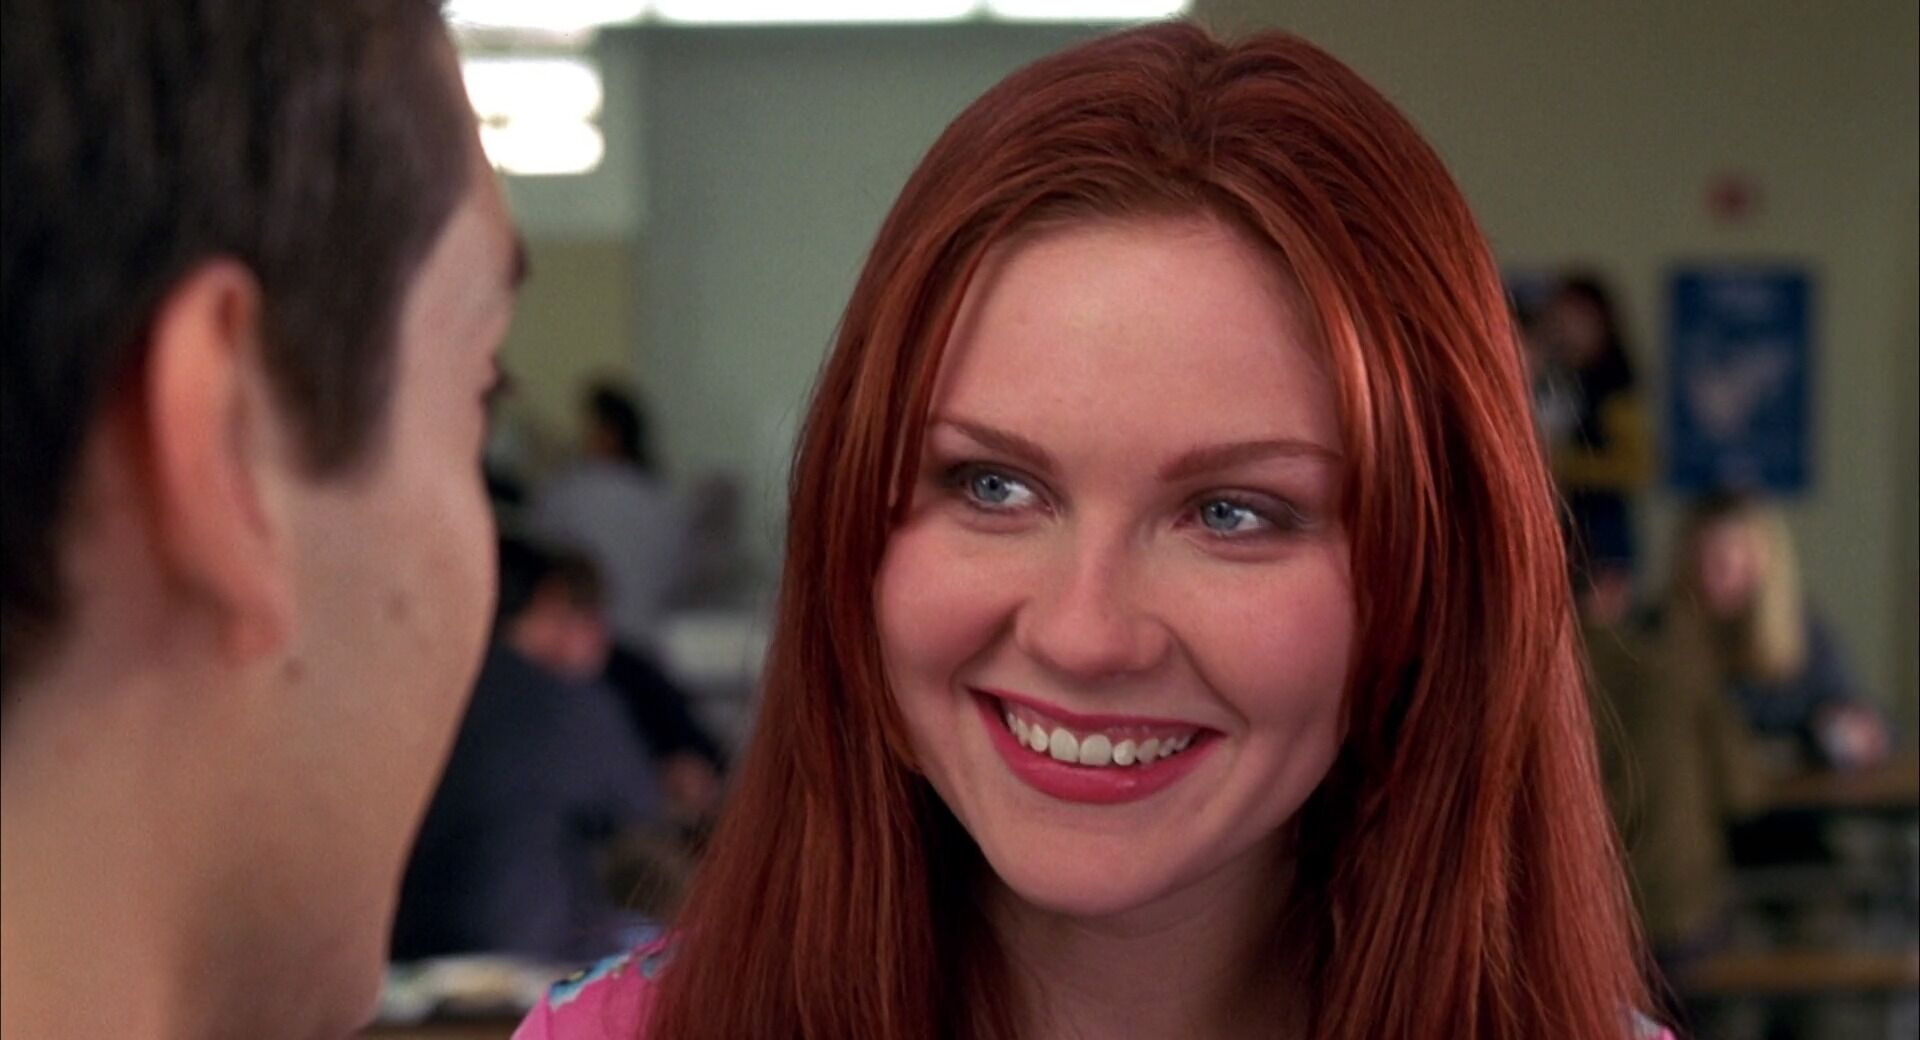 Spider Man Kirsten Dunst Reveals Her Feelings On The Spider Man Reboots